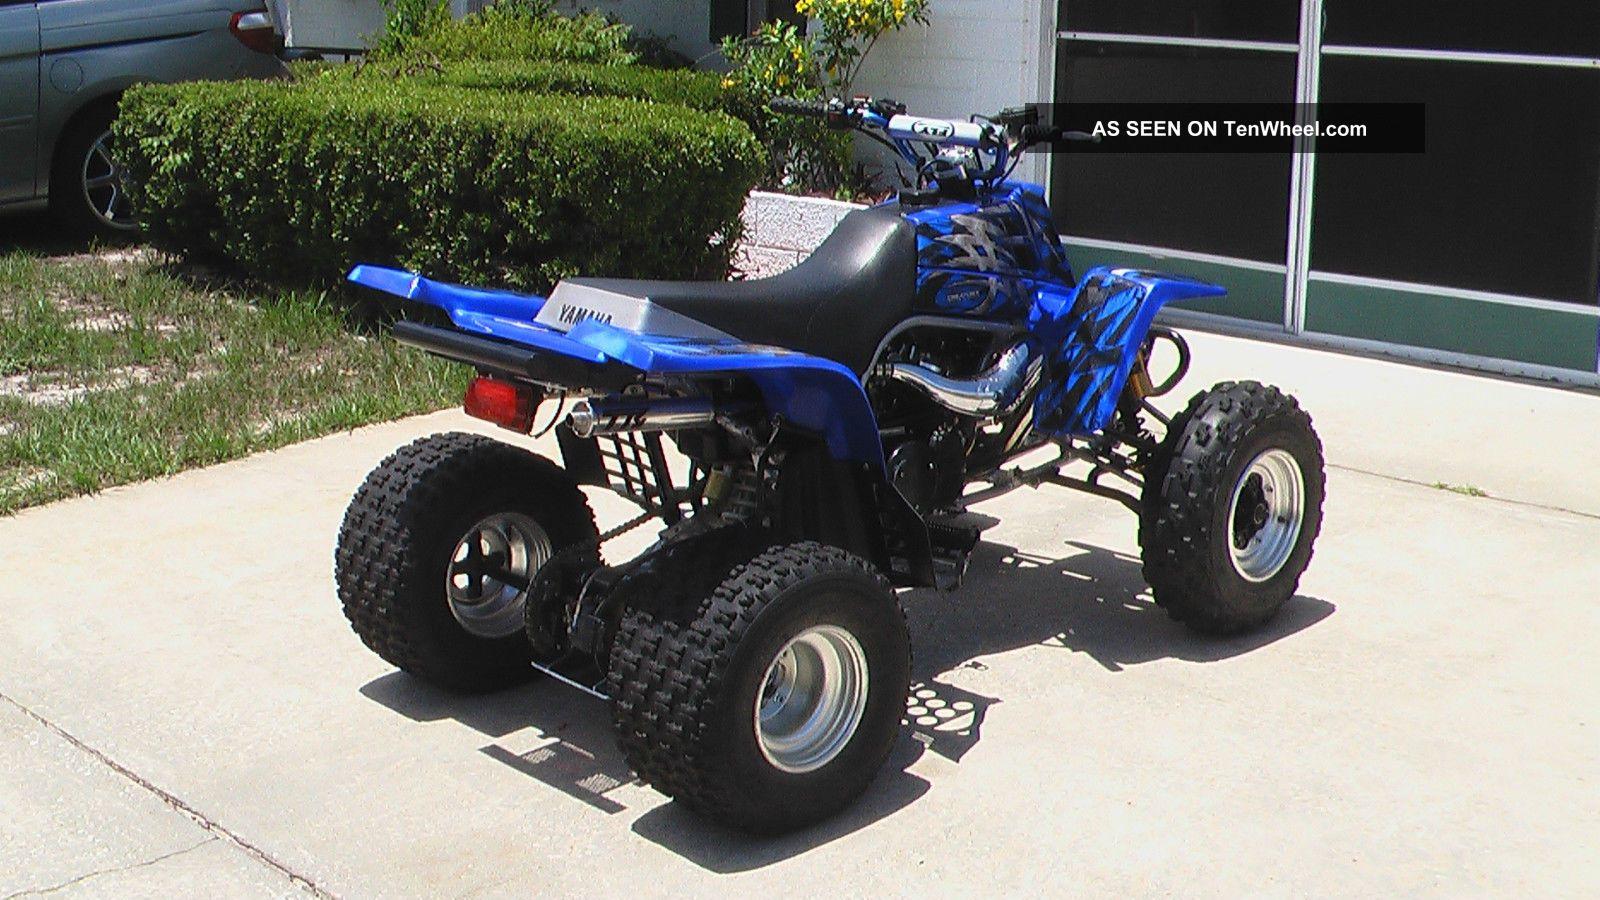 2002 Yamaha Banshee